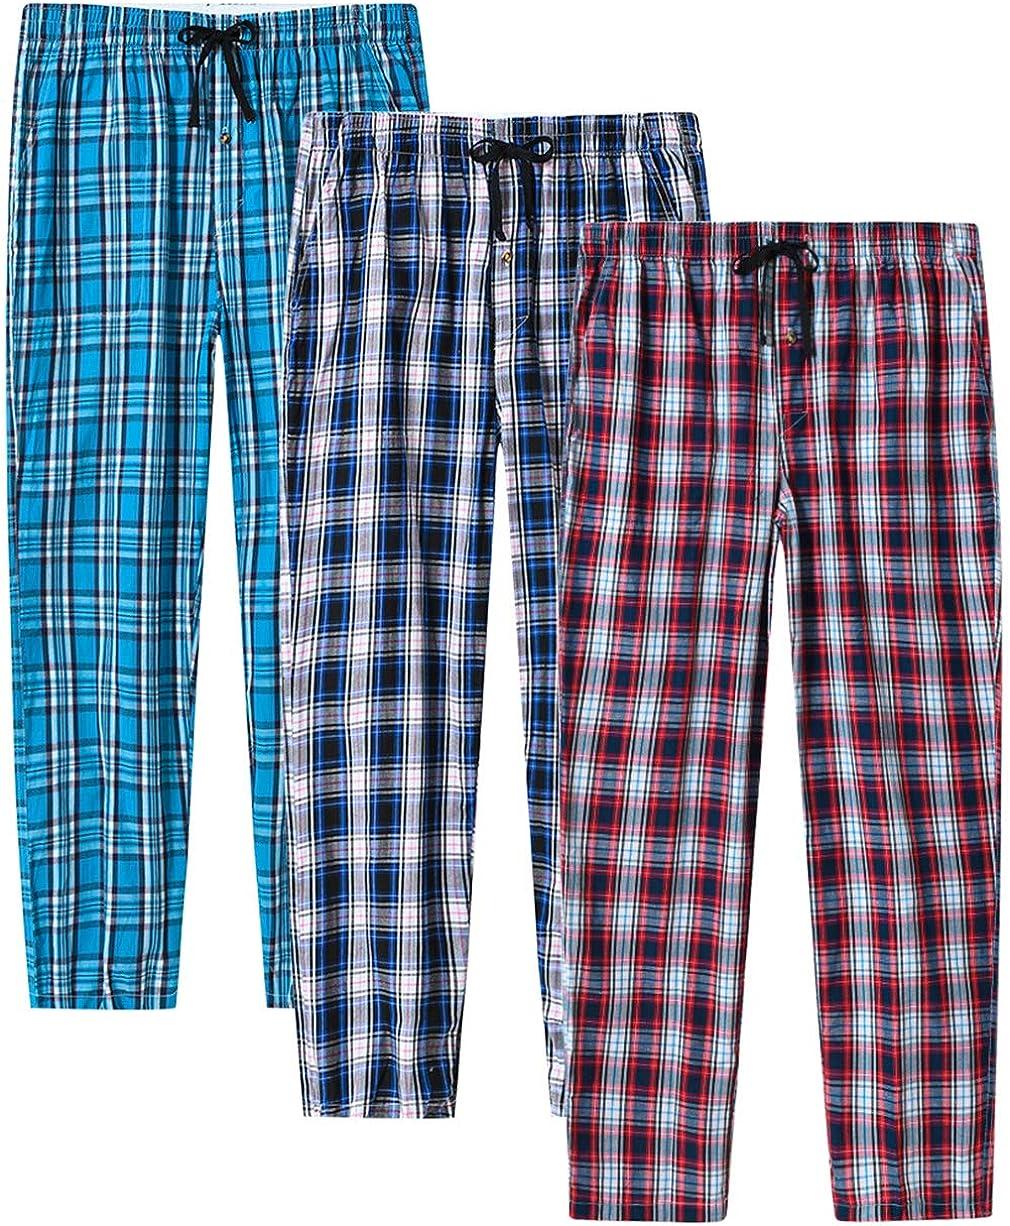 JINSHI Men's Pajama Pants Cotton Arlington Mall Plaid Pan Cheap mail order sales Bottoms Lounge